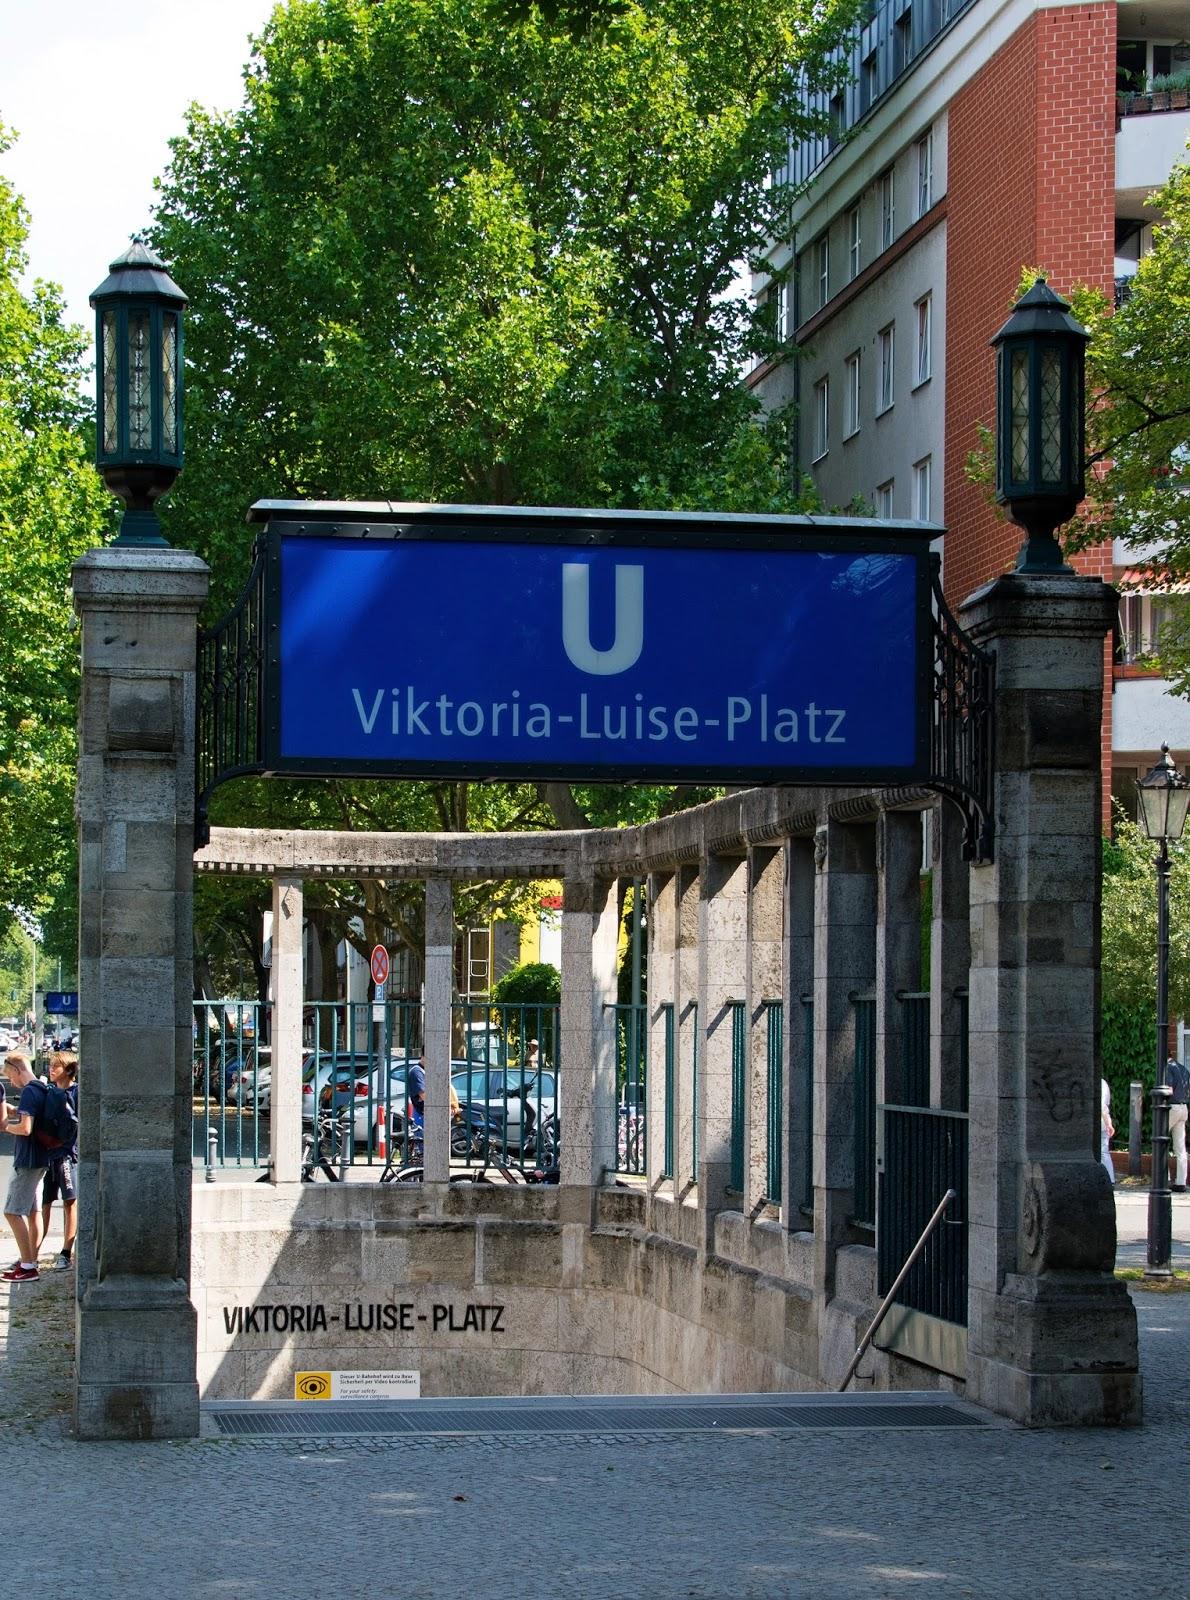 Viktoria-Louise-Platz